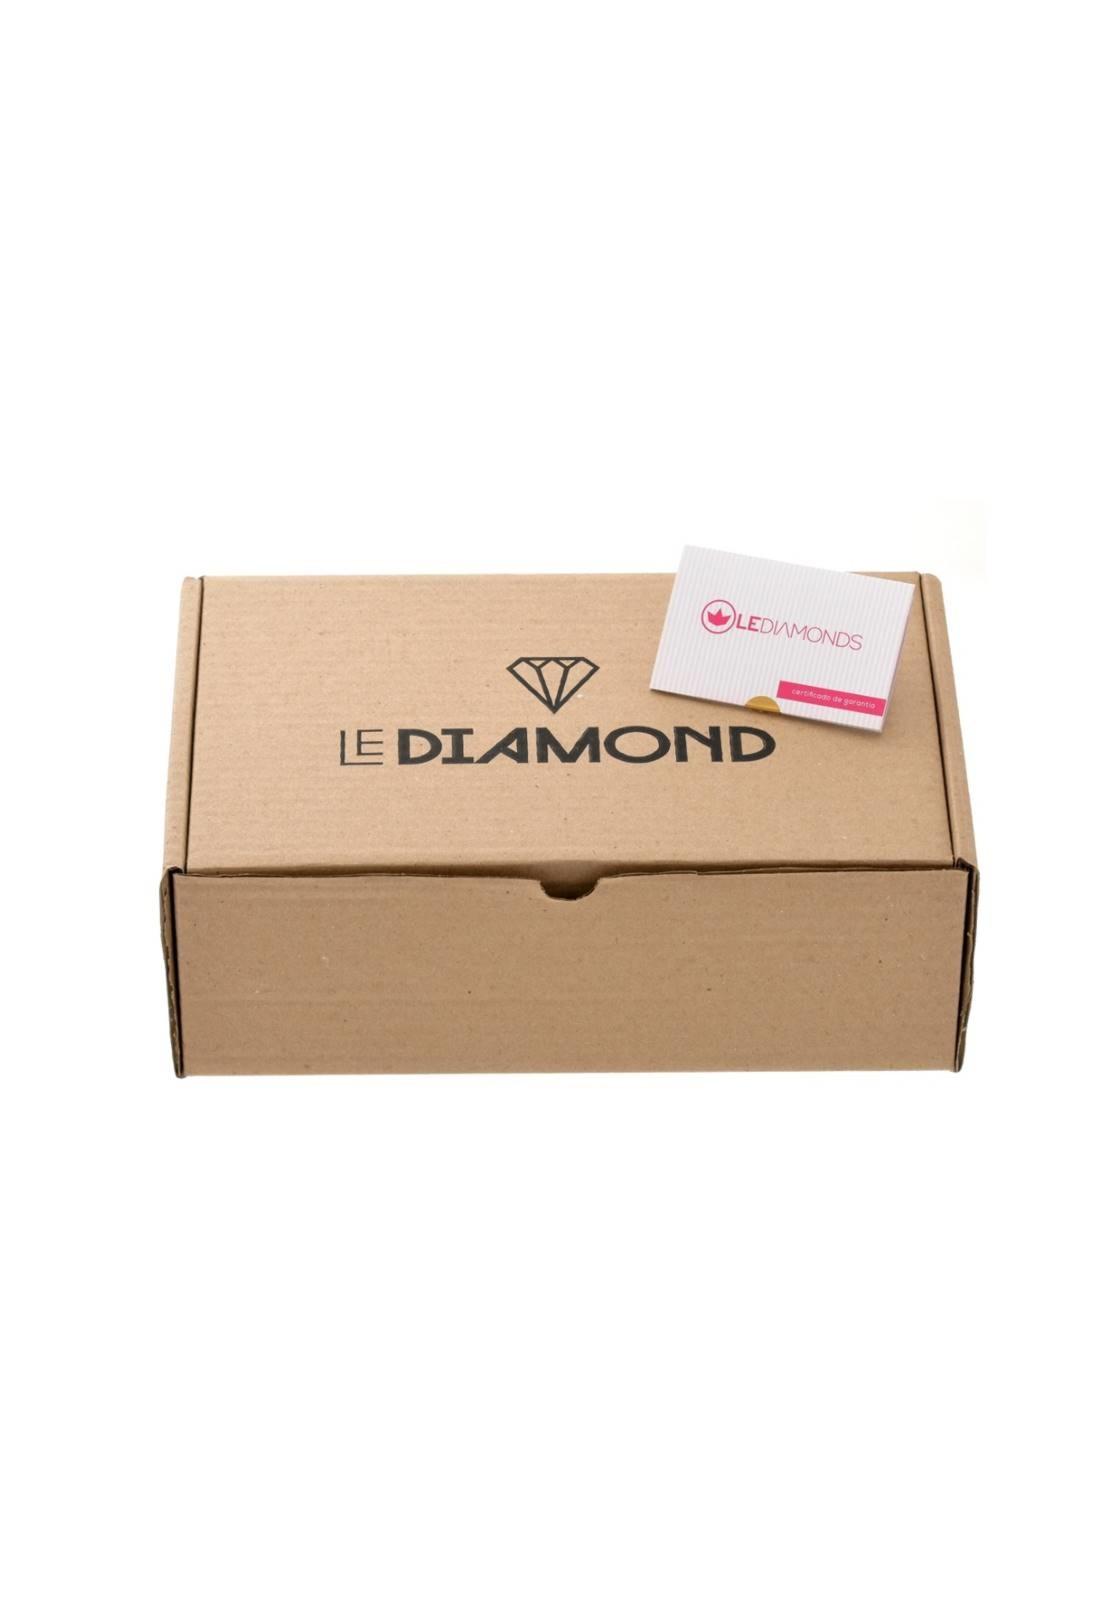 Brinco Le Diamond Amandita Fios de Seda Dourado